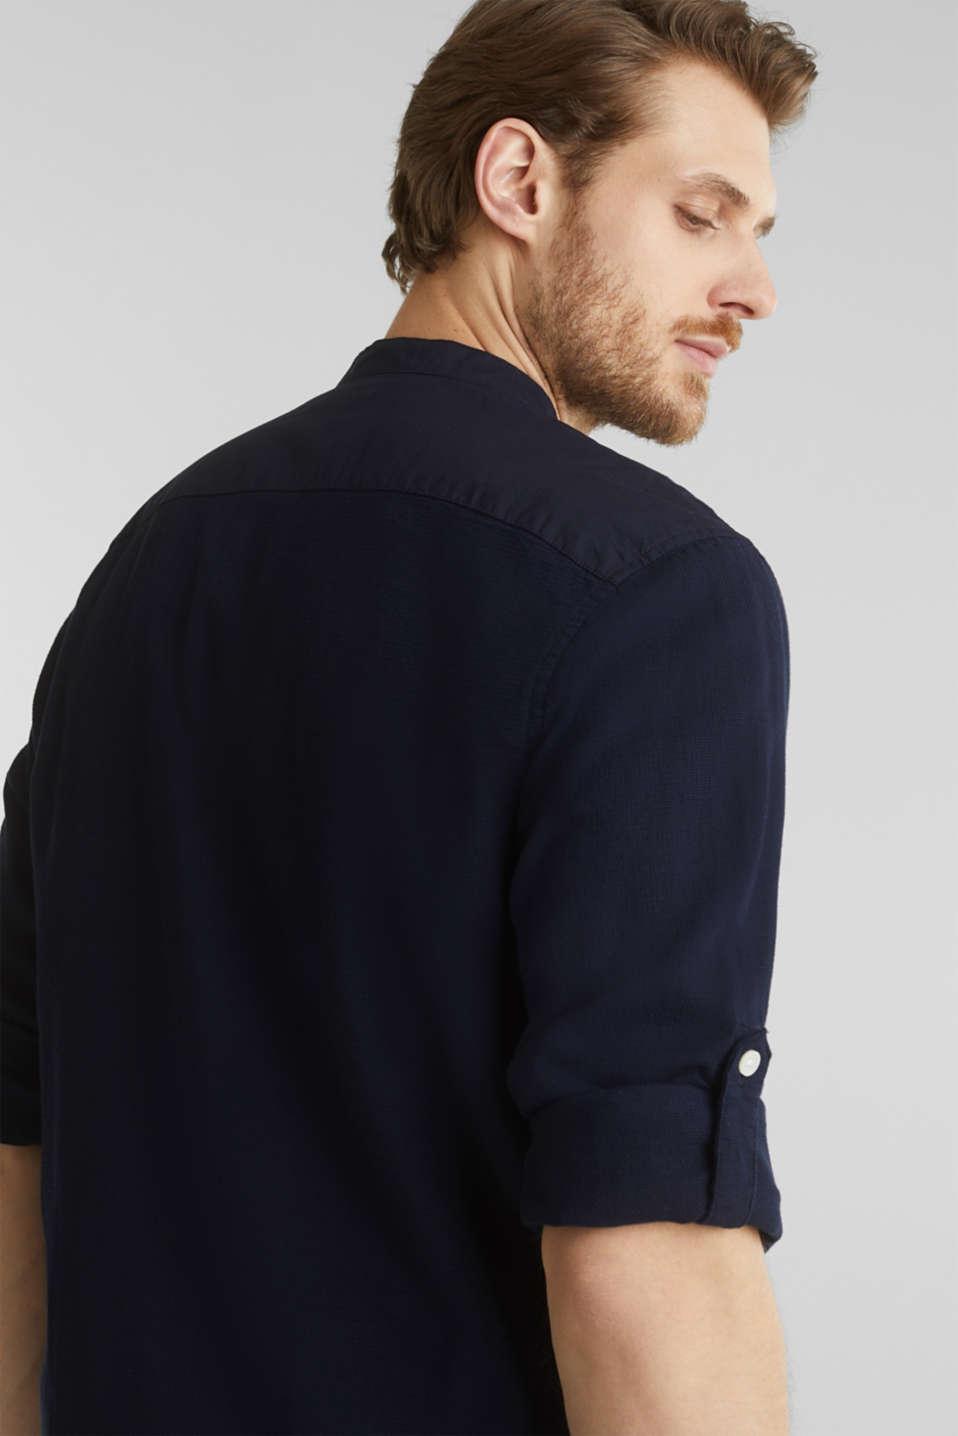 Textured shirt made of 100% organic, NAVY 5, detail image number 5